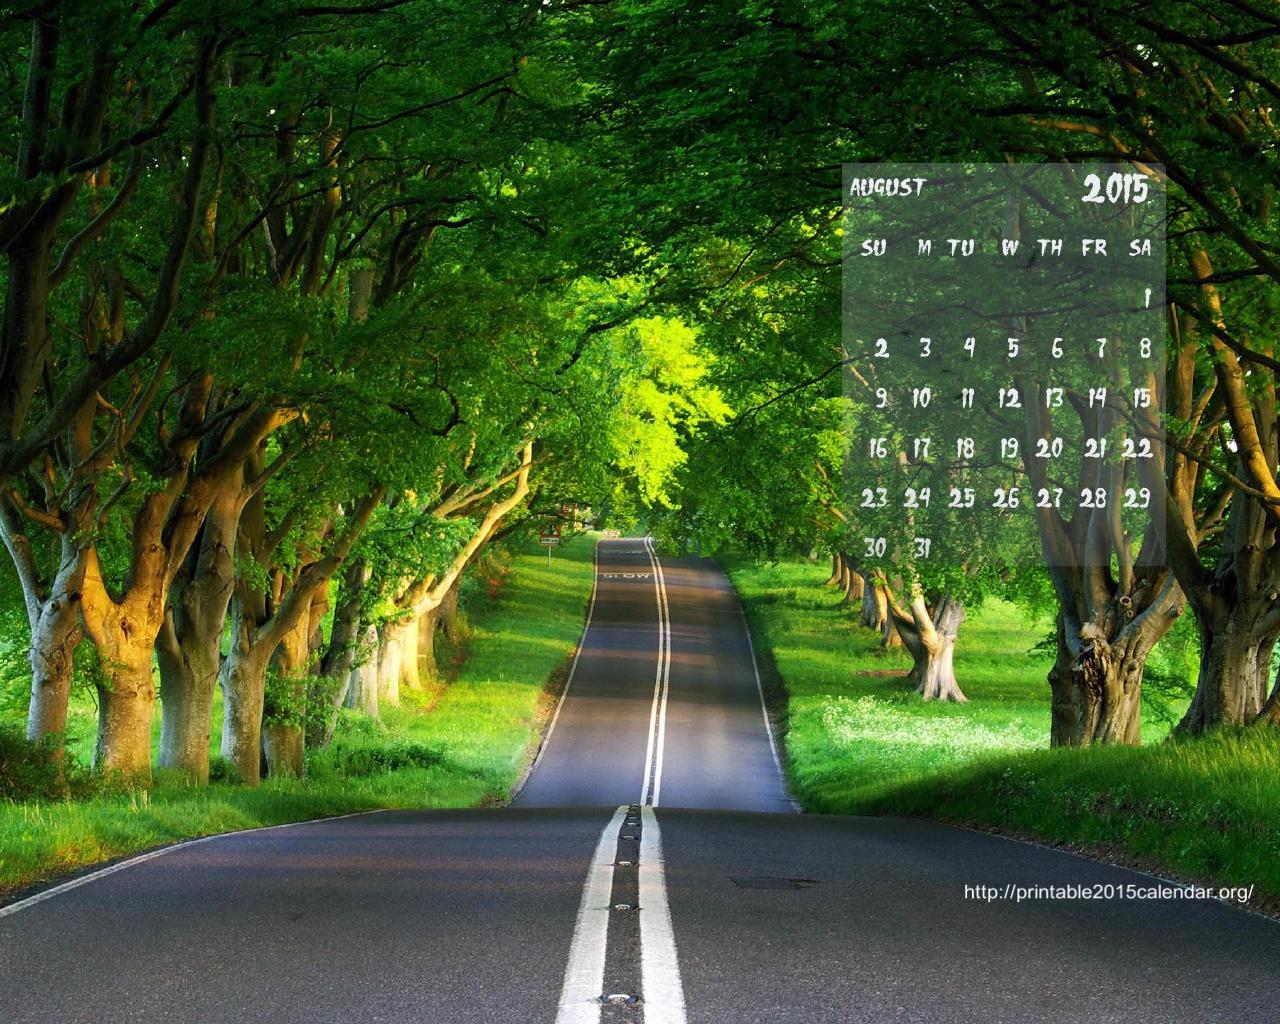 Calendar 2015 Pictures 2015 Calendar 1280x1024